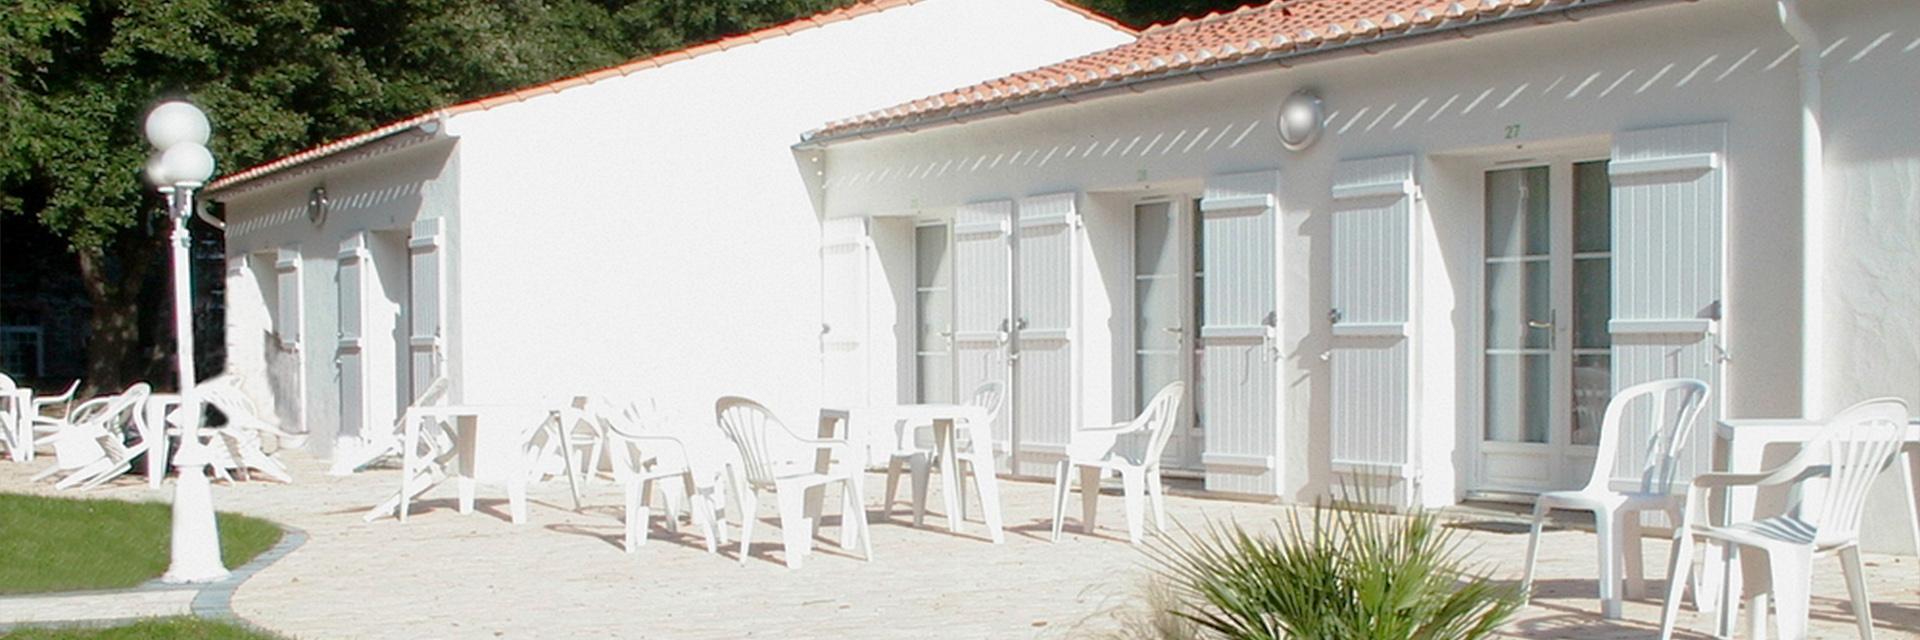 Village_club_vacances_vendee-koat-ar-mor-terrasse